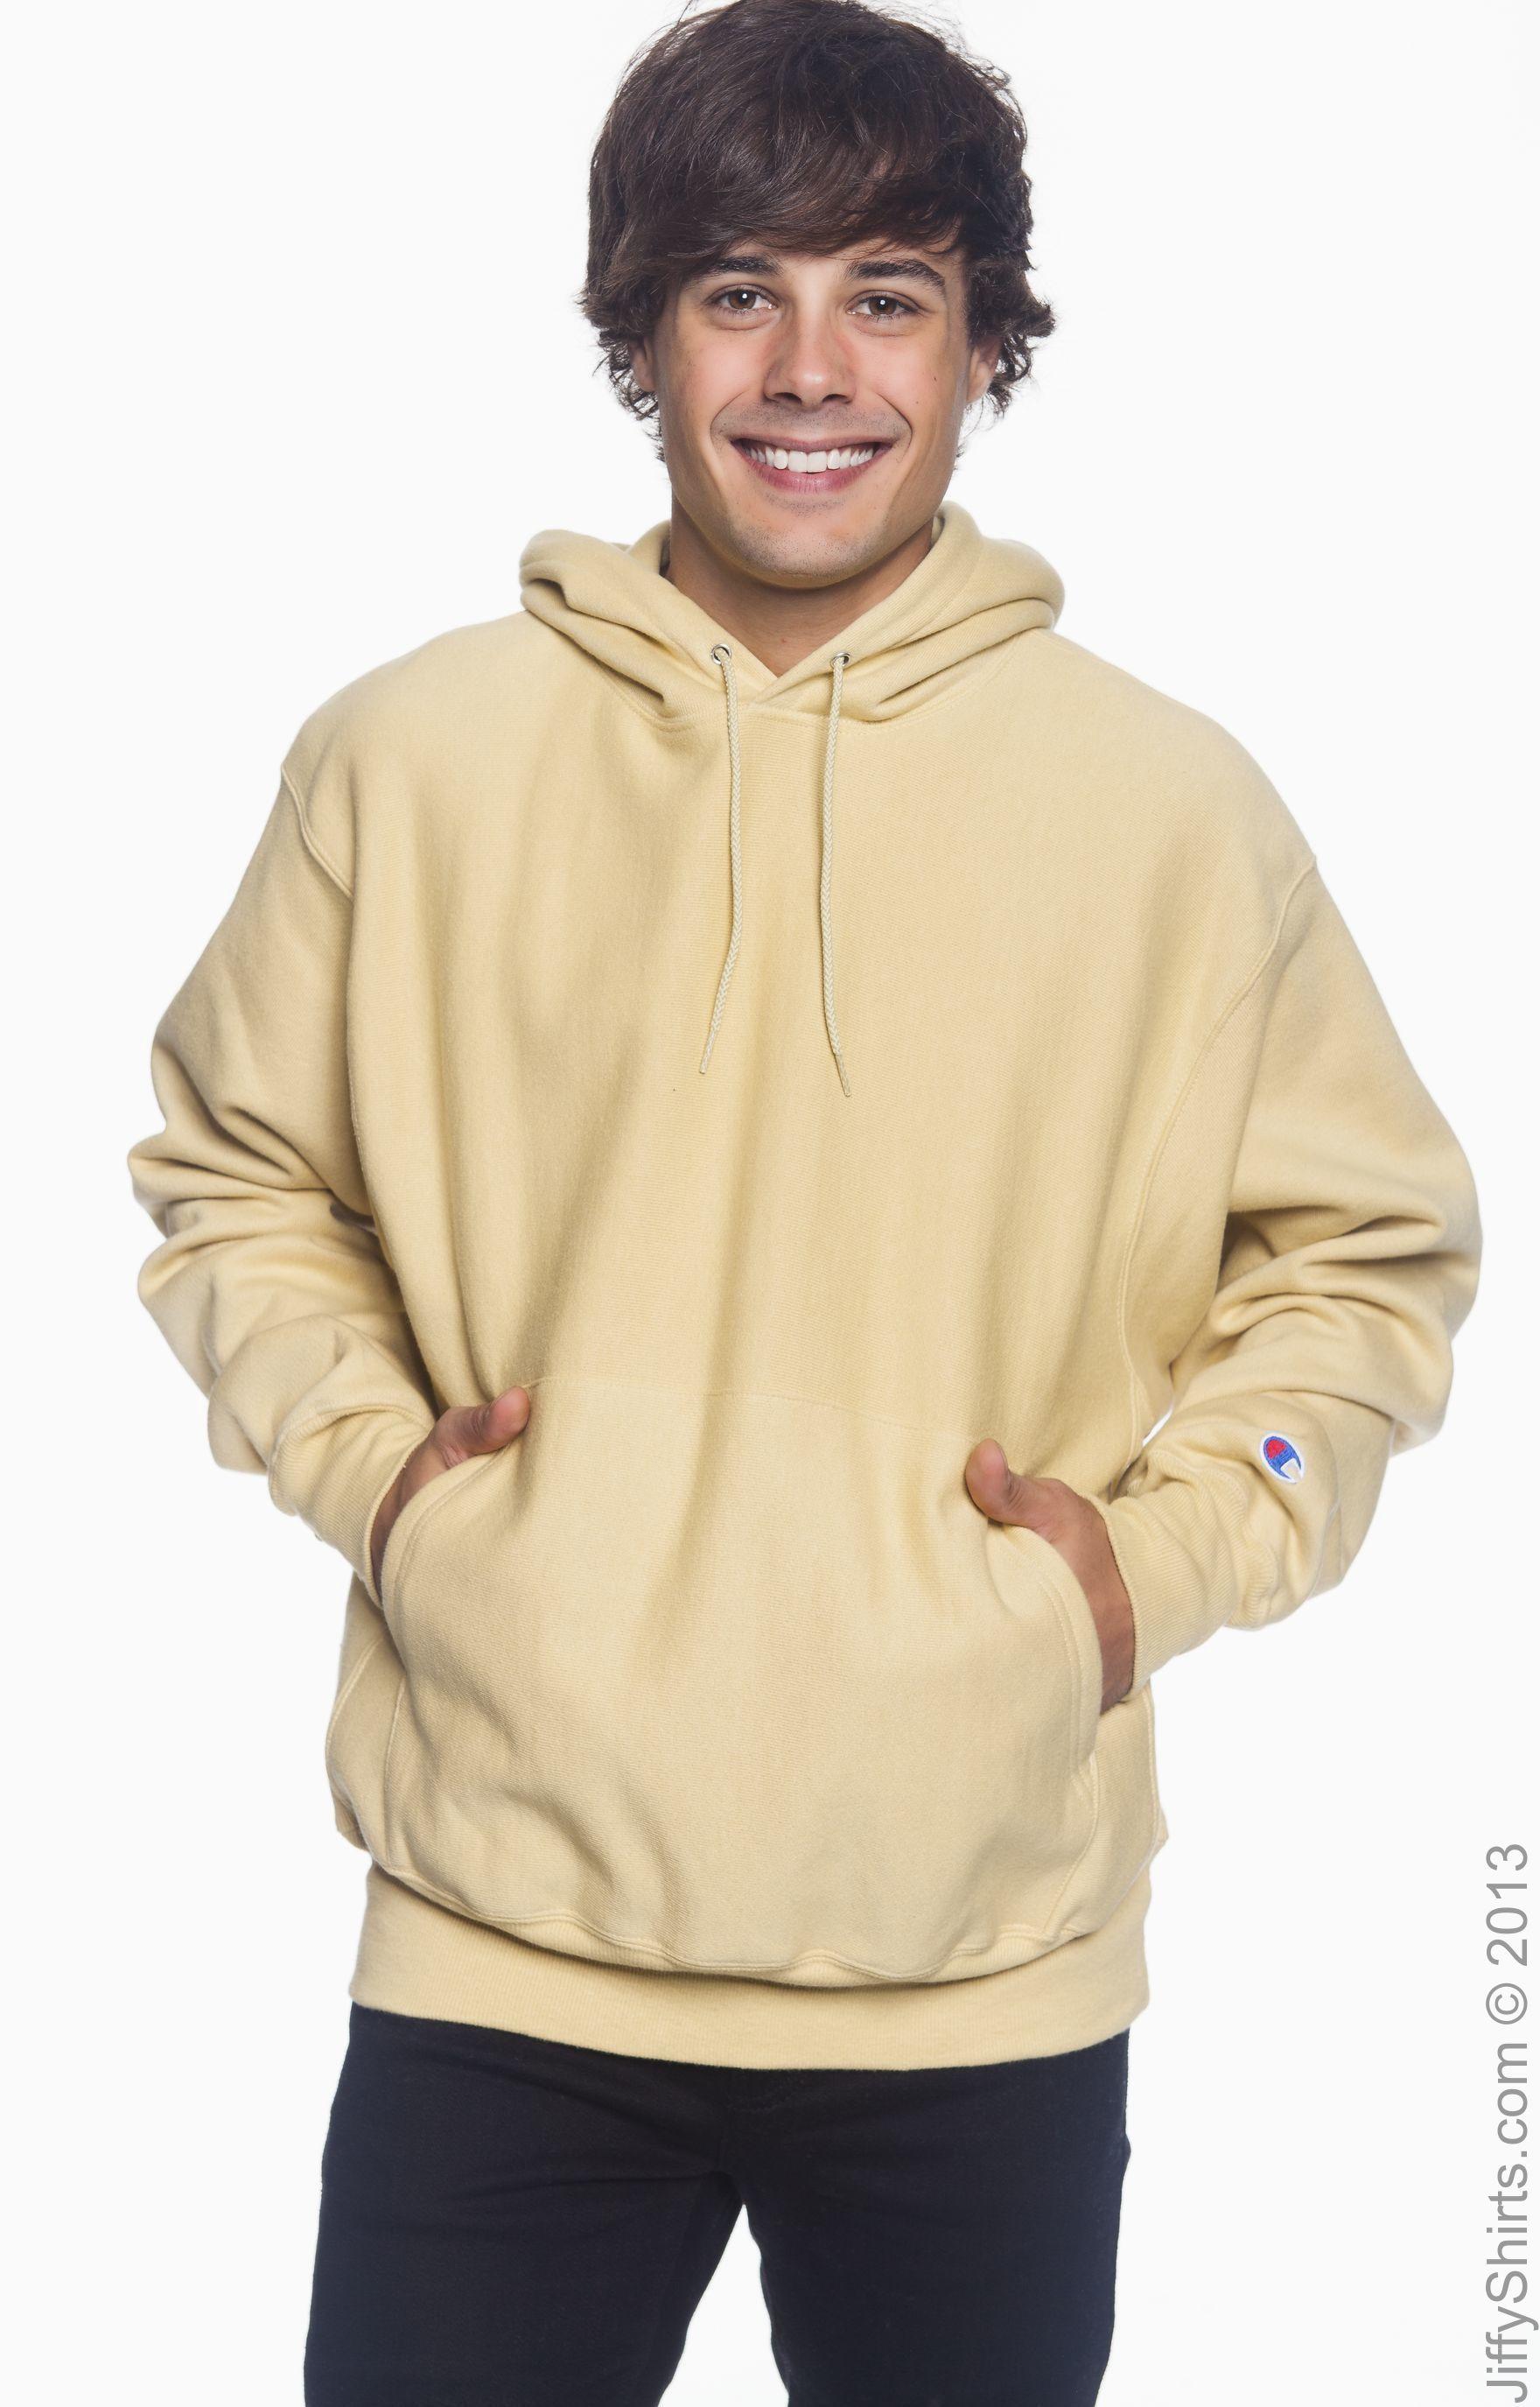 Champion S1051 White Reverse Weave 12 Oz Pullover Hooded Sweatshirt Hooded Sweatshirts Hooded Pullover Sweatshirts [ 2750 x 1760 Pixel ]